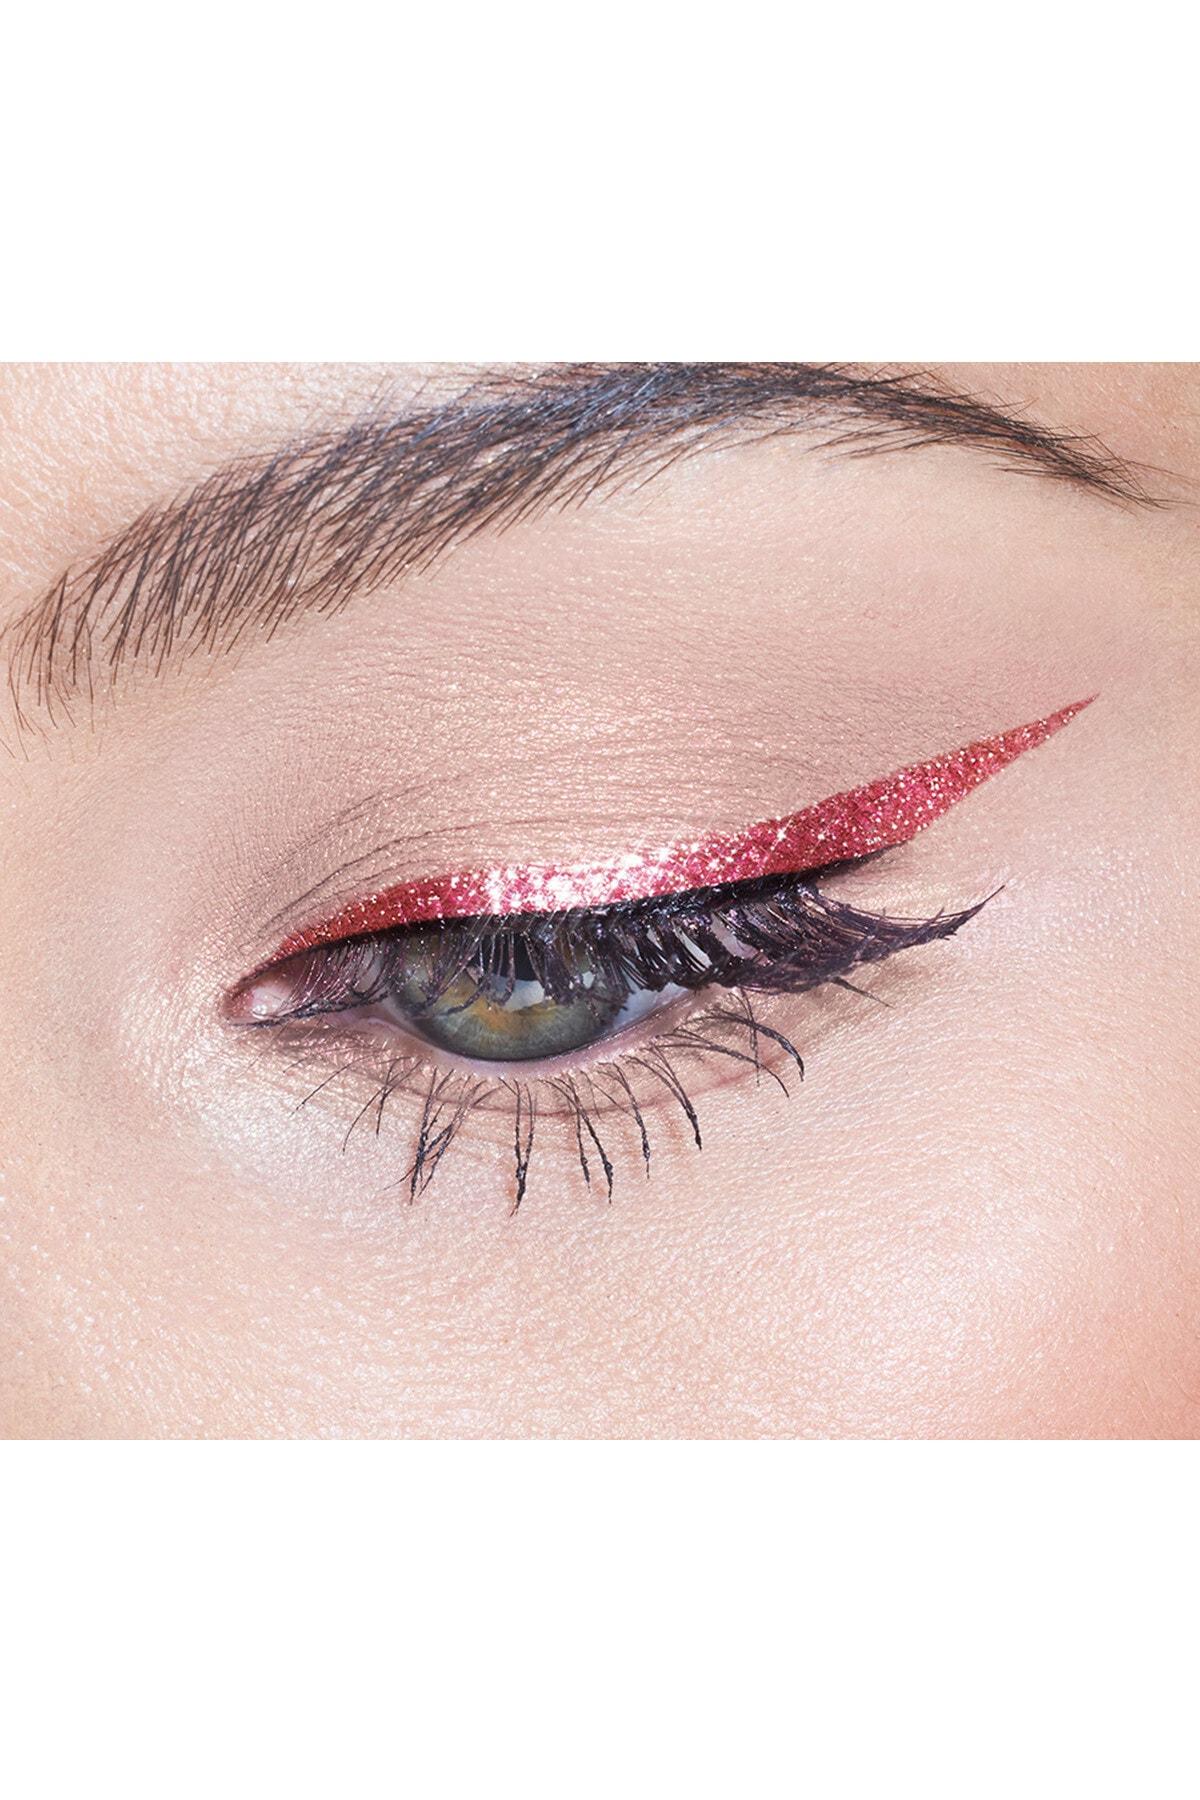 AVON Mark Pearlesque Liquid Eyeliner - Pearly Pınk 2